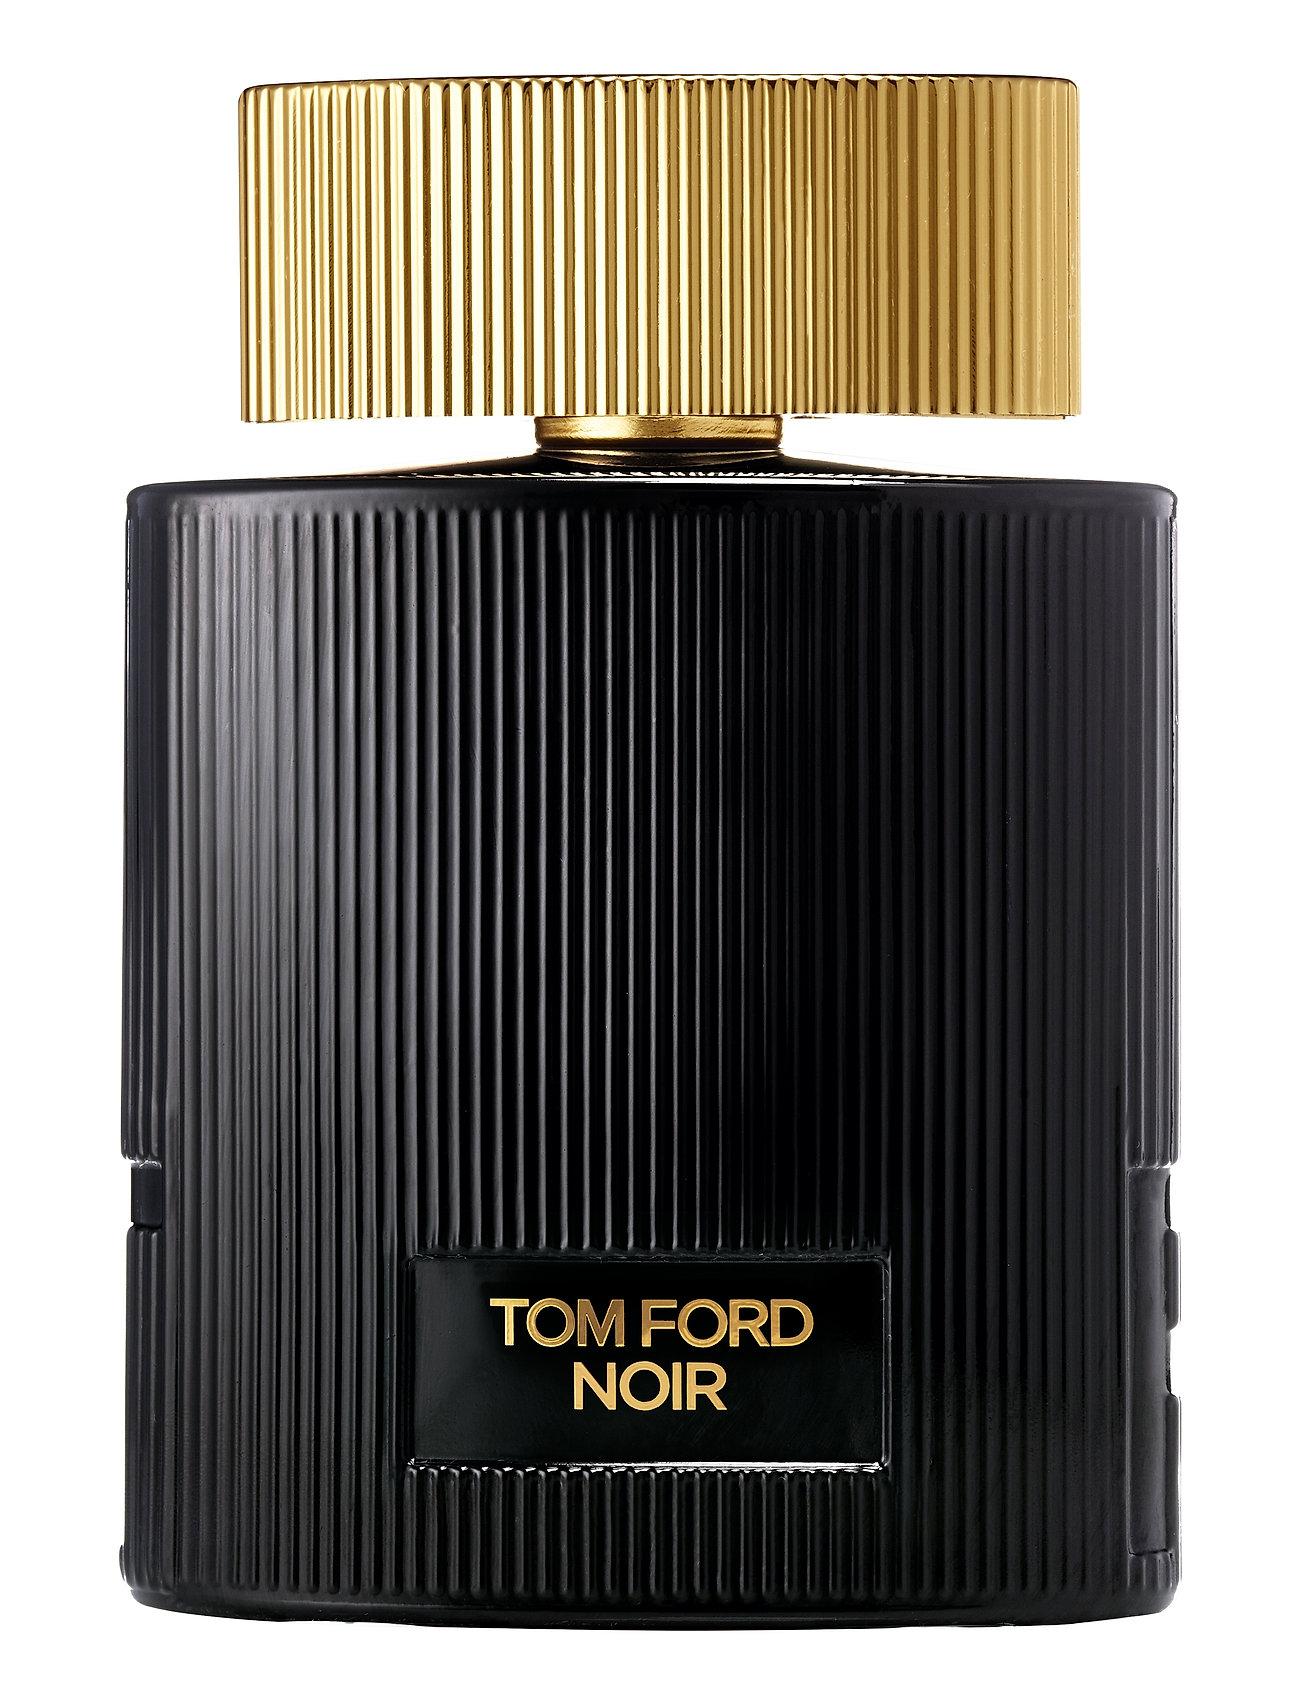 tom ford – Tom ford noir pour femme eau de parfum på boozt.com dk